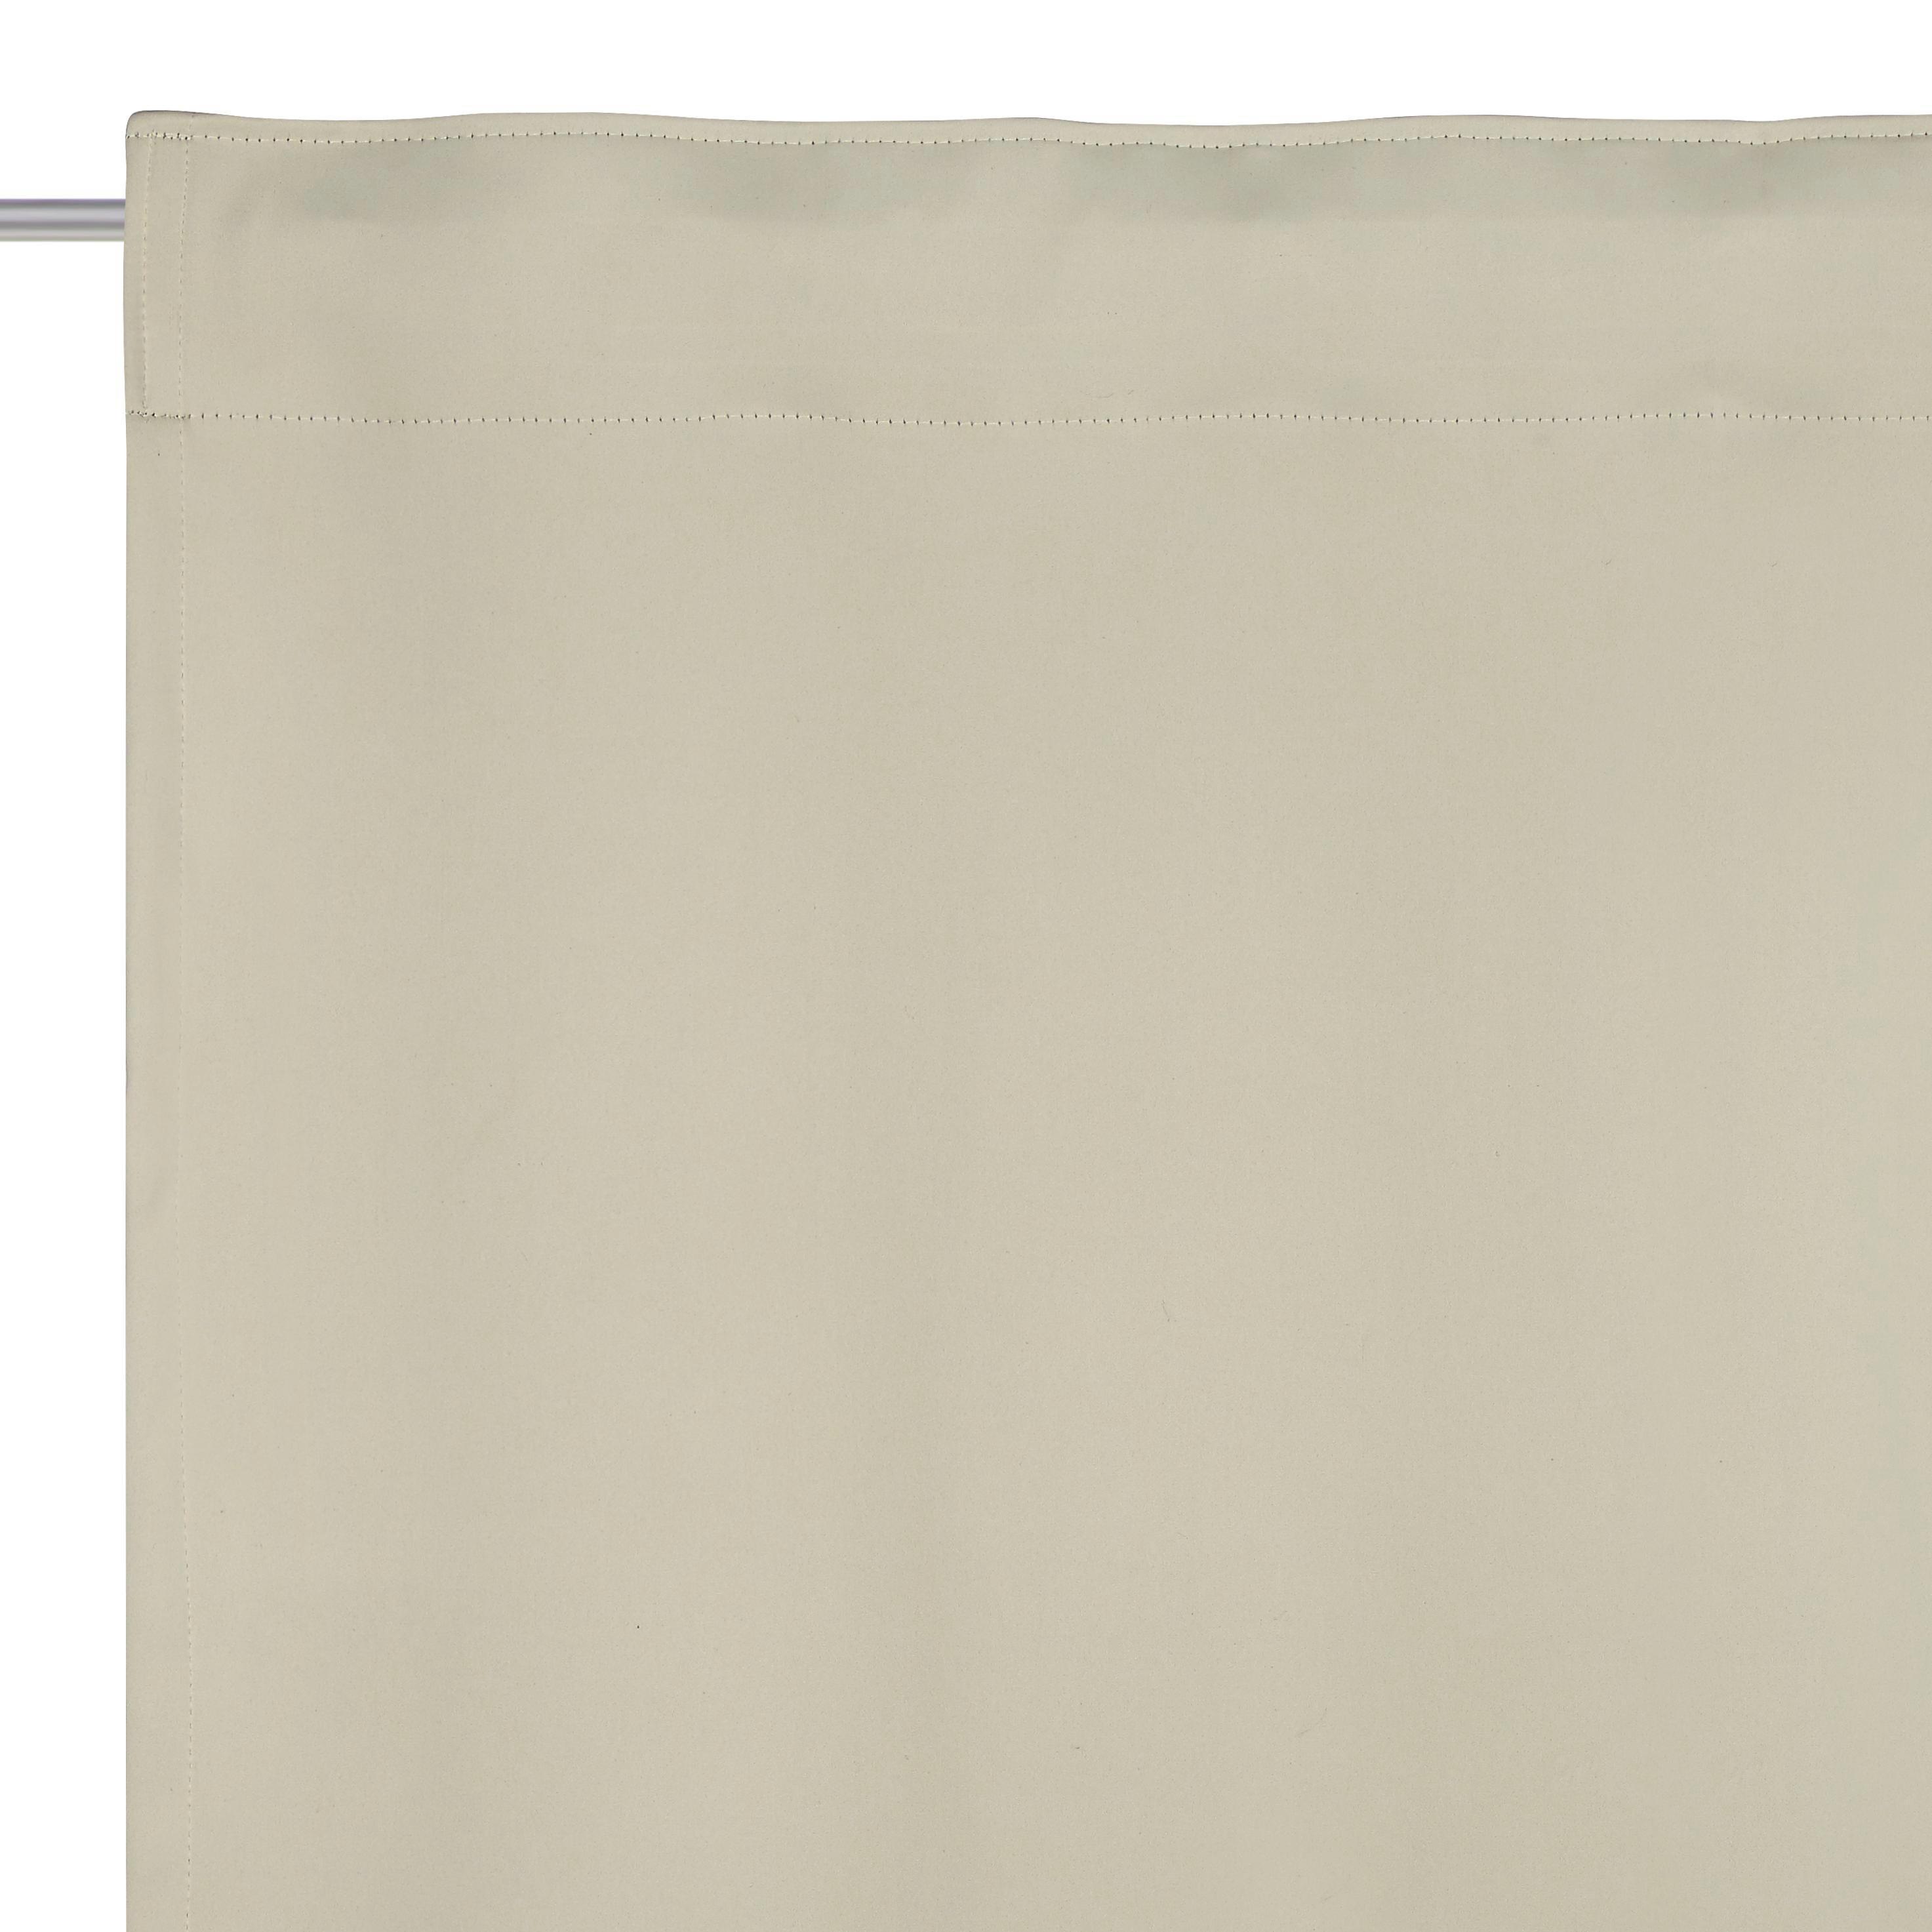 GARDINLÄNGD - naturfärgad, Basics, textil (140/300cm) - Esposa